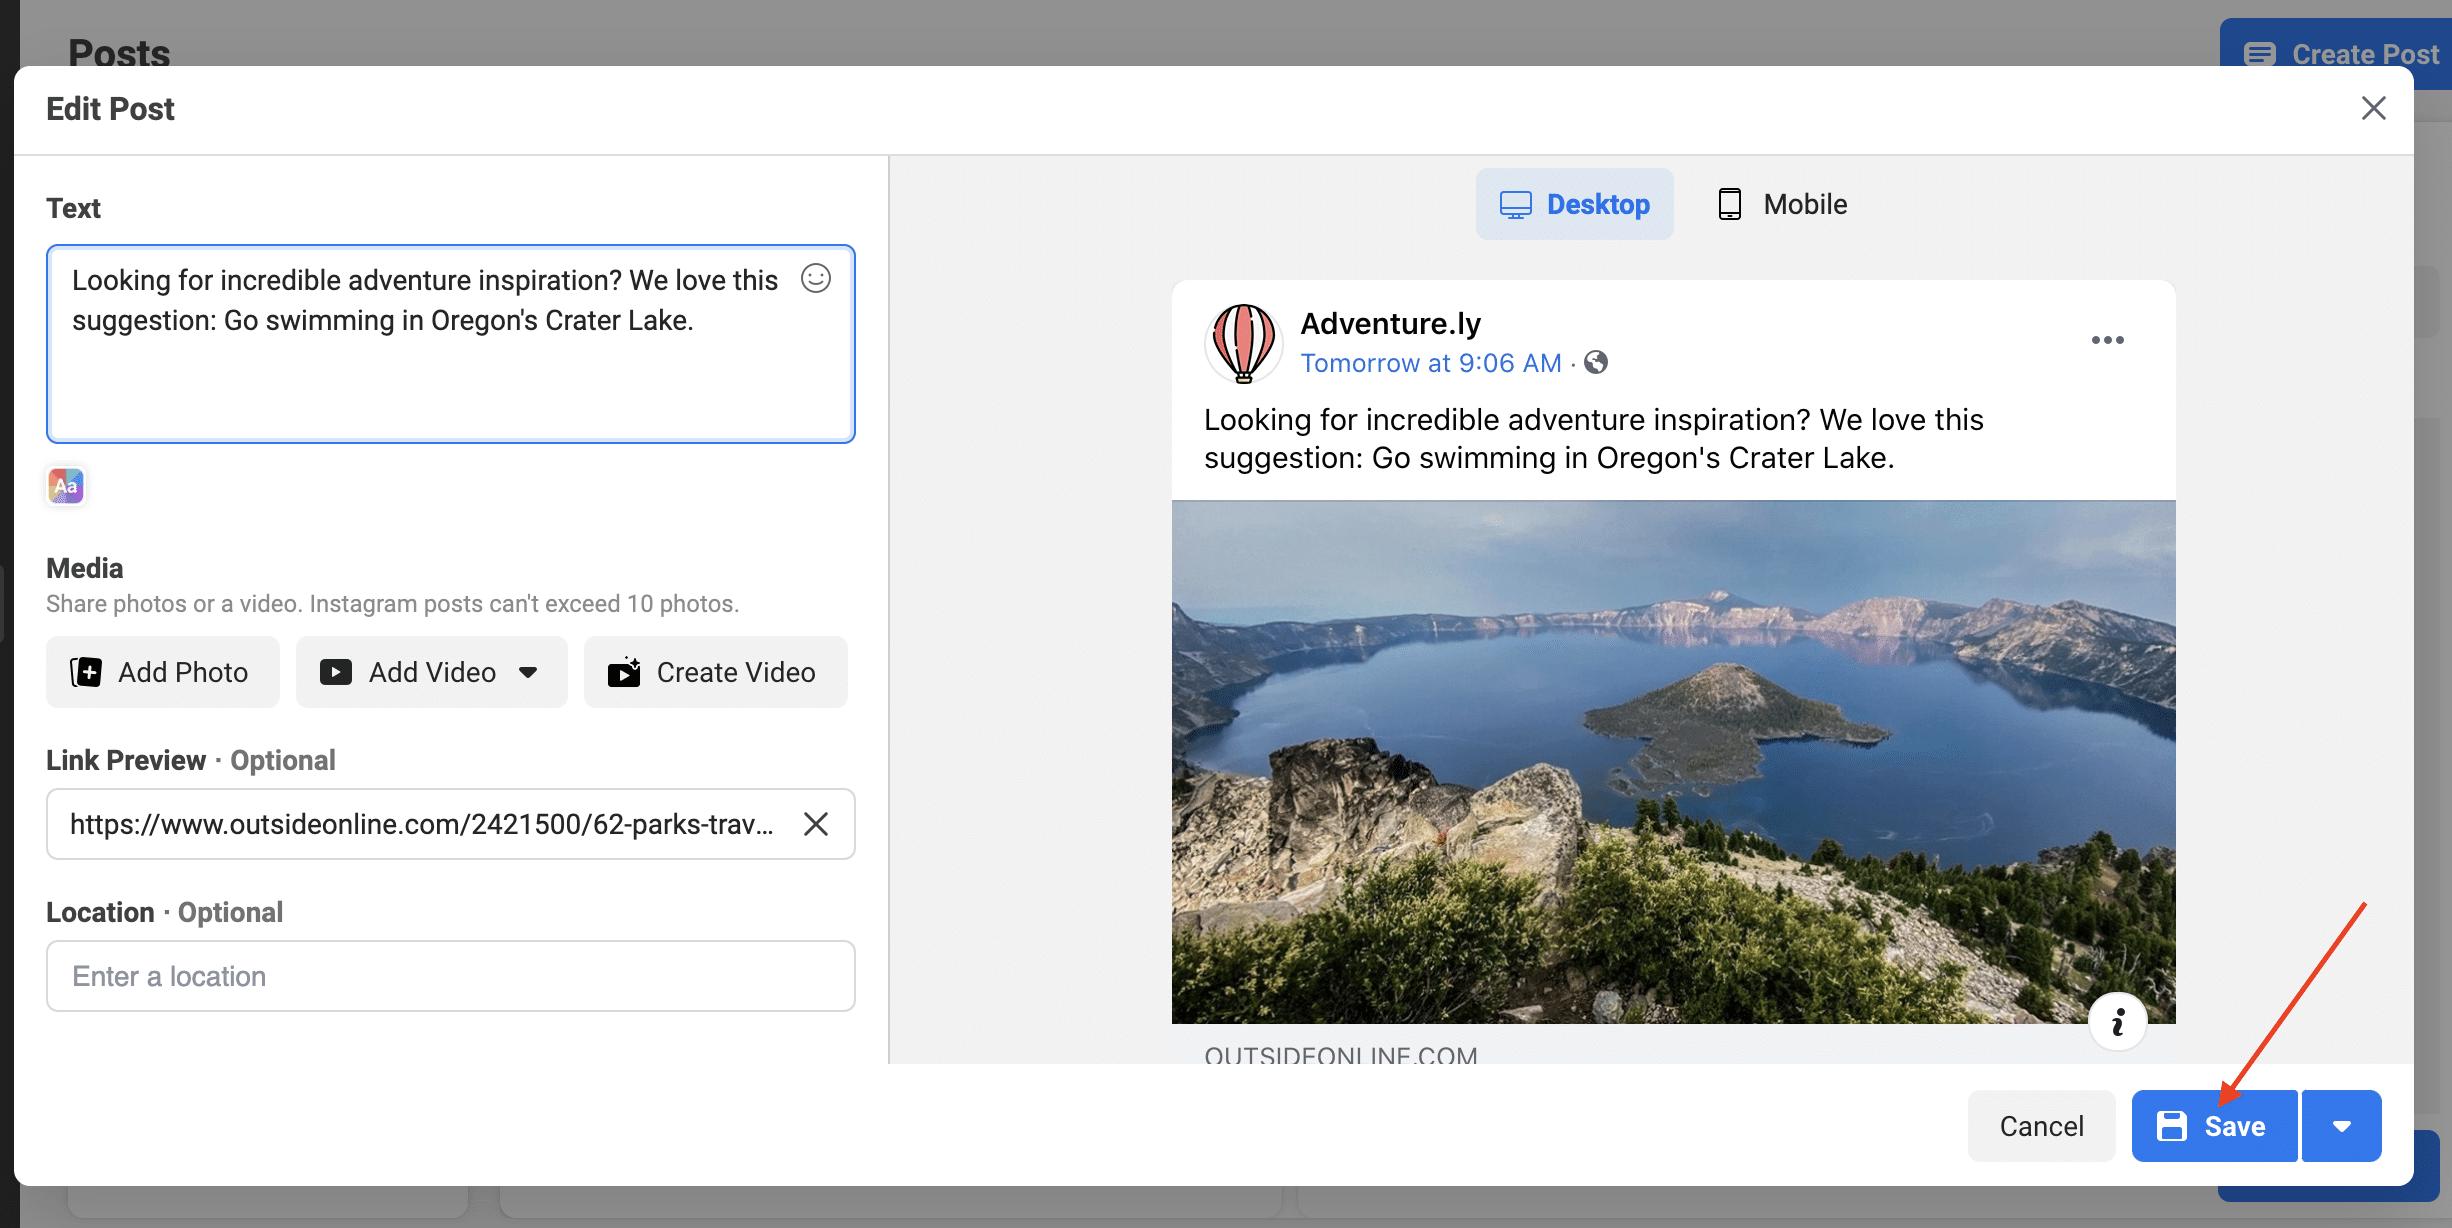 make and save edits